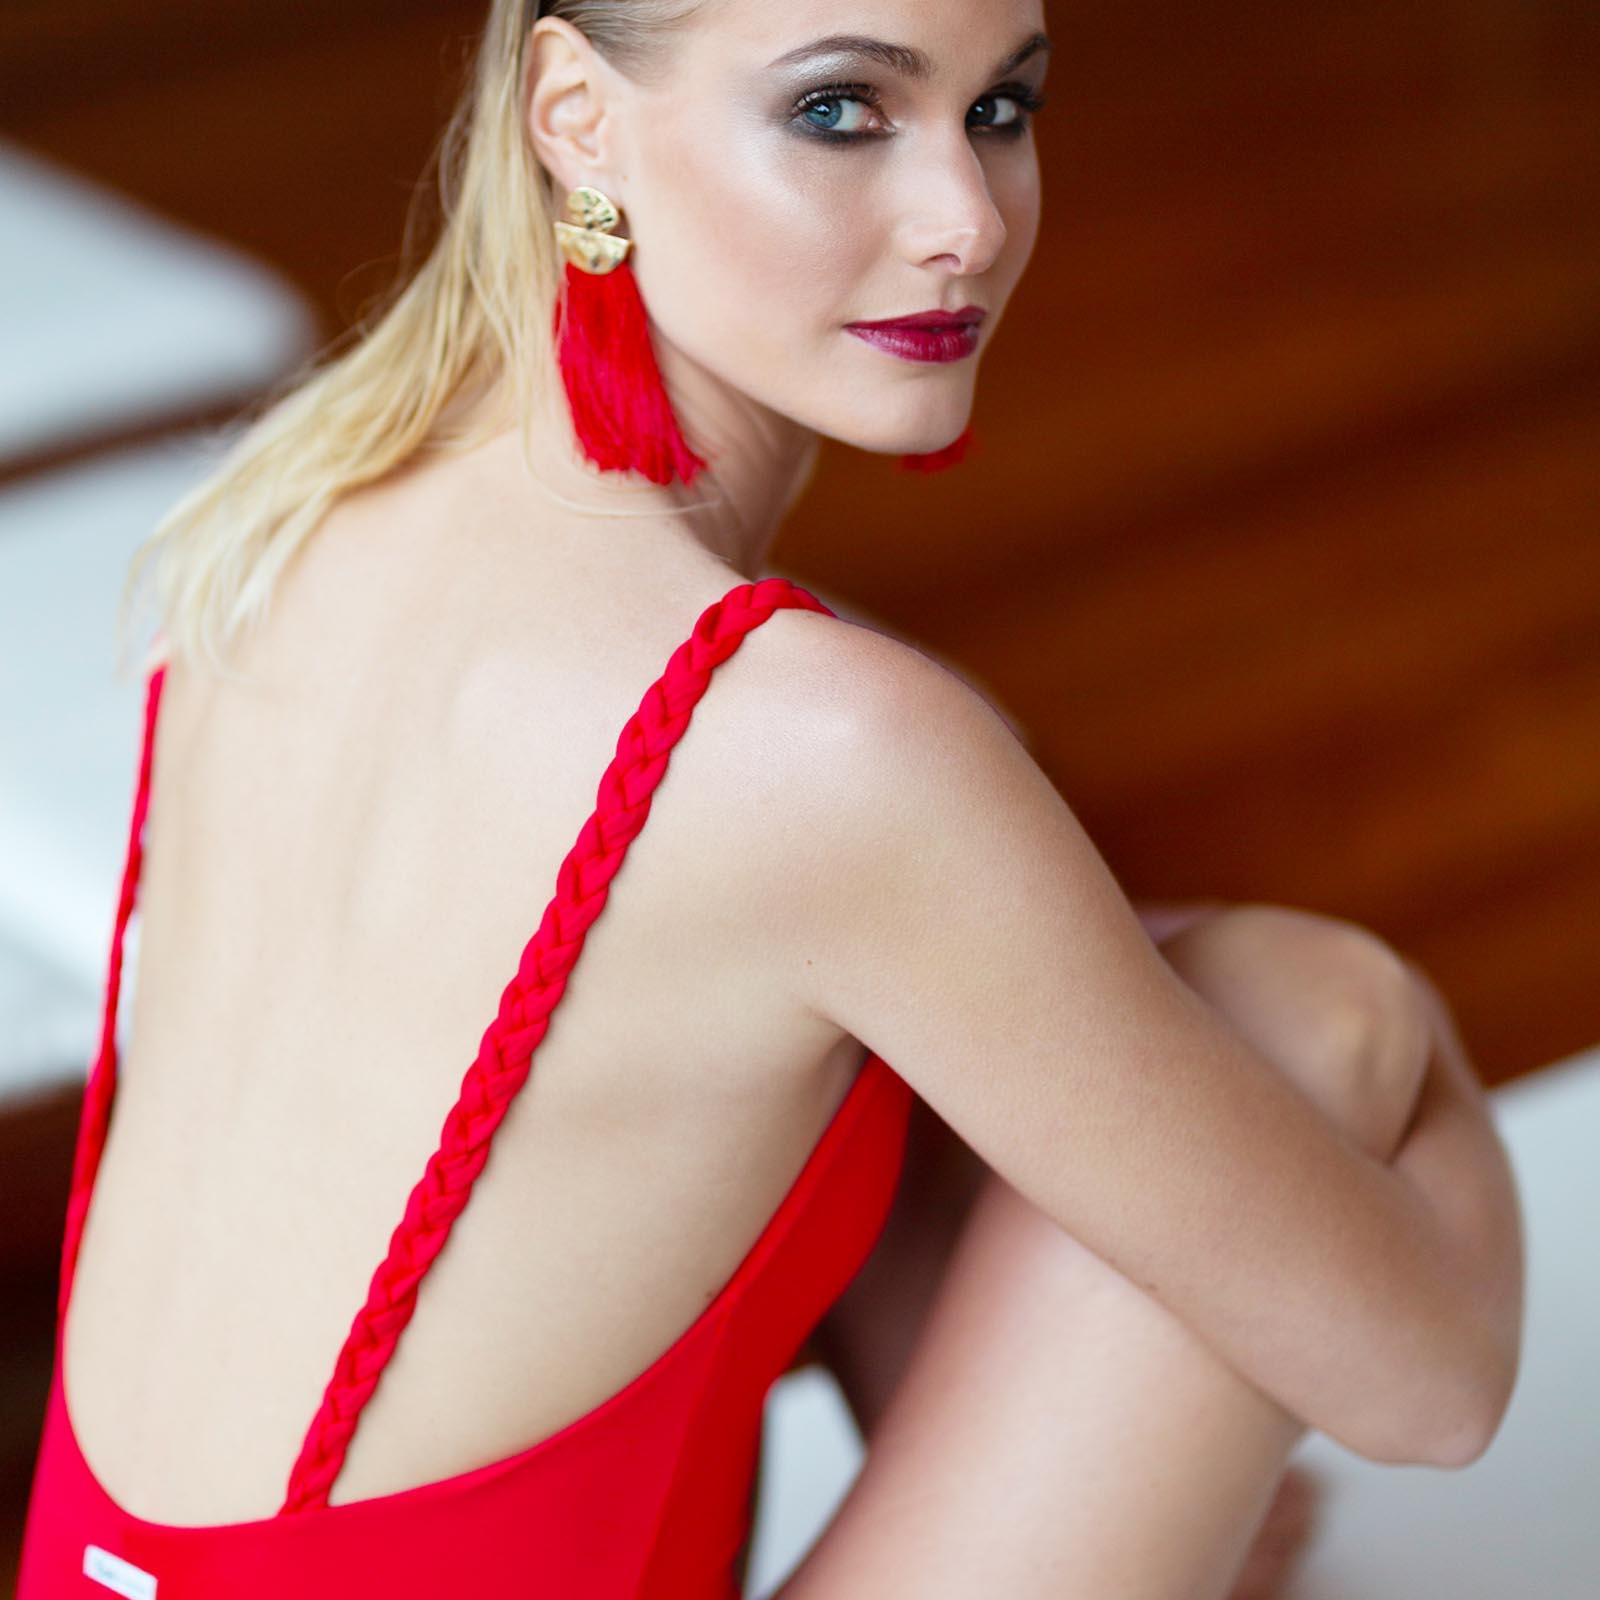 Kinda 3D Swimwear red vanilla one piece swuimsuit bathing suit costume rosso intero calzedonia tezenis la reveche